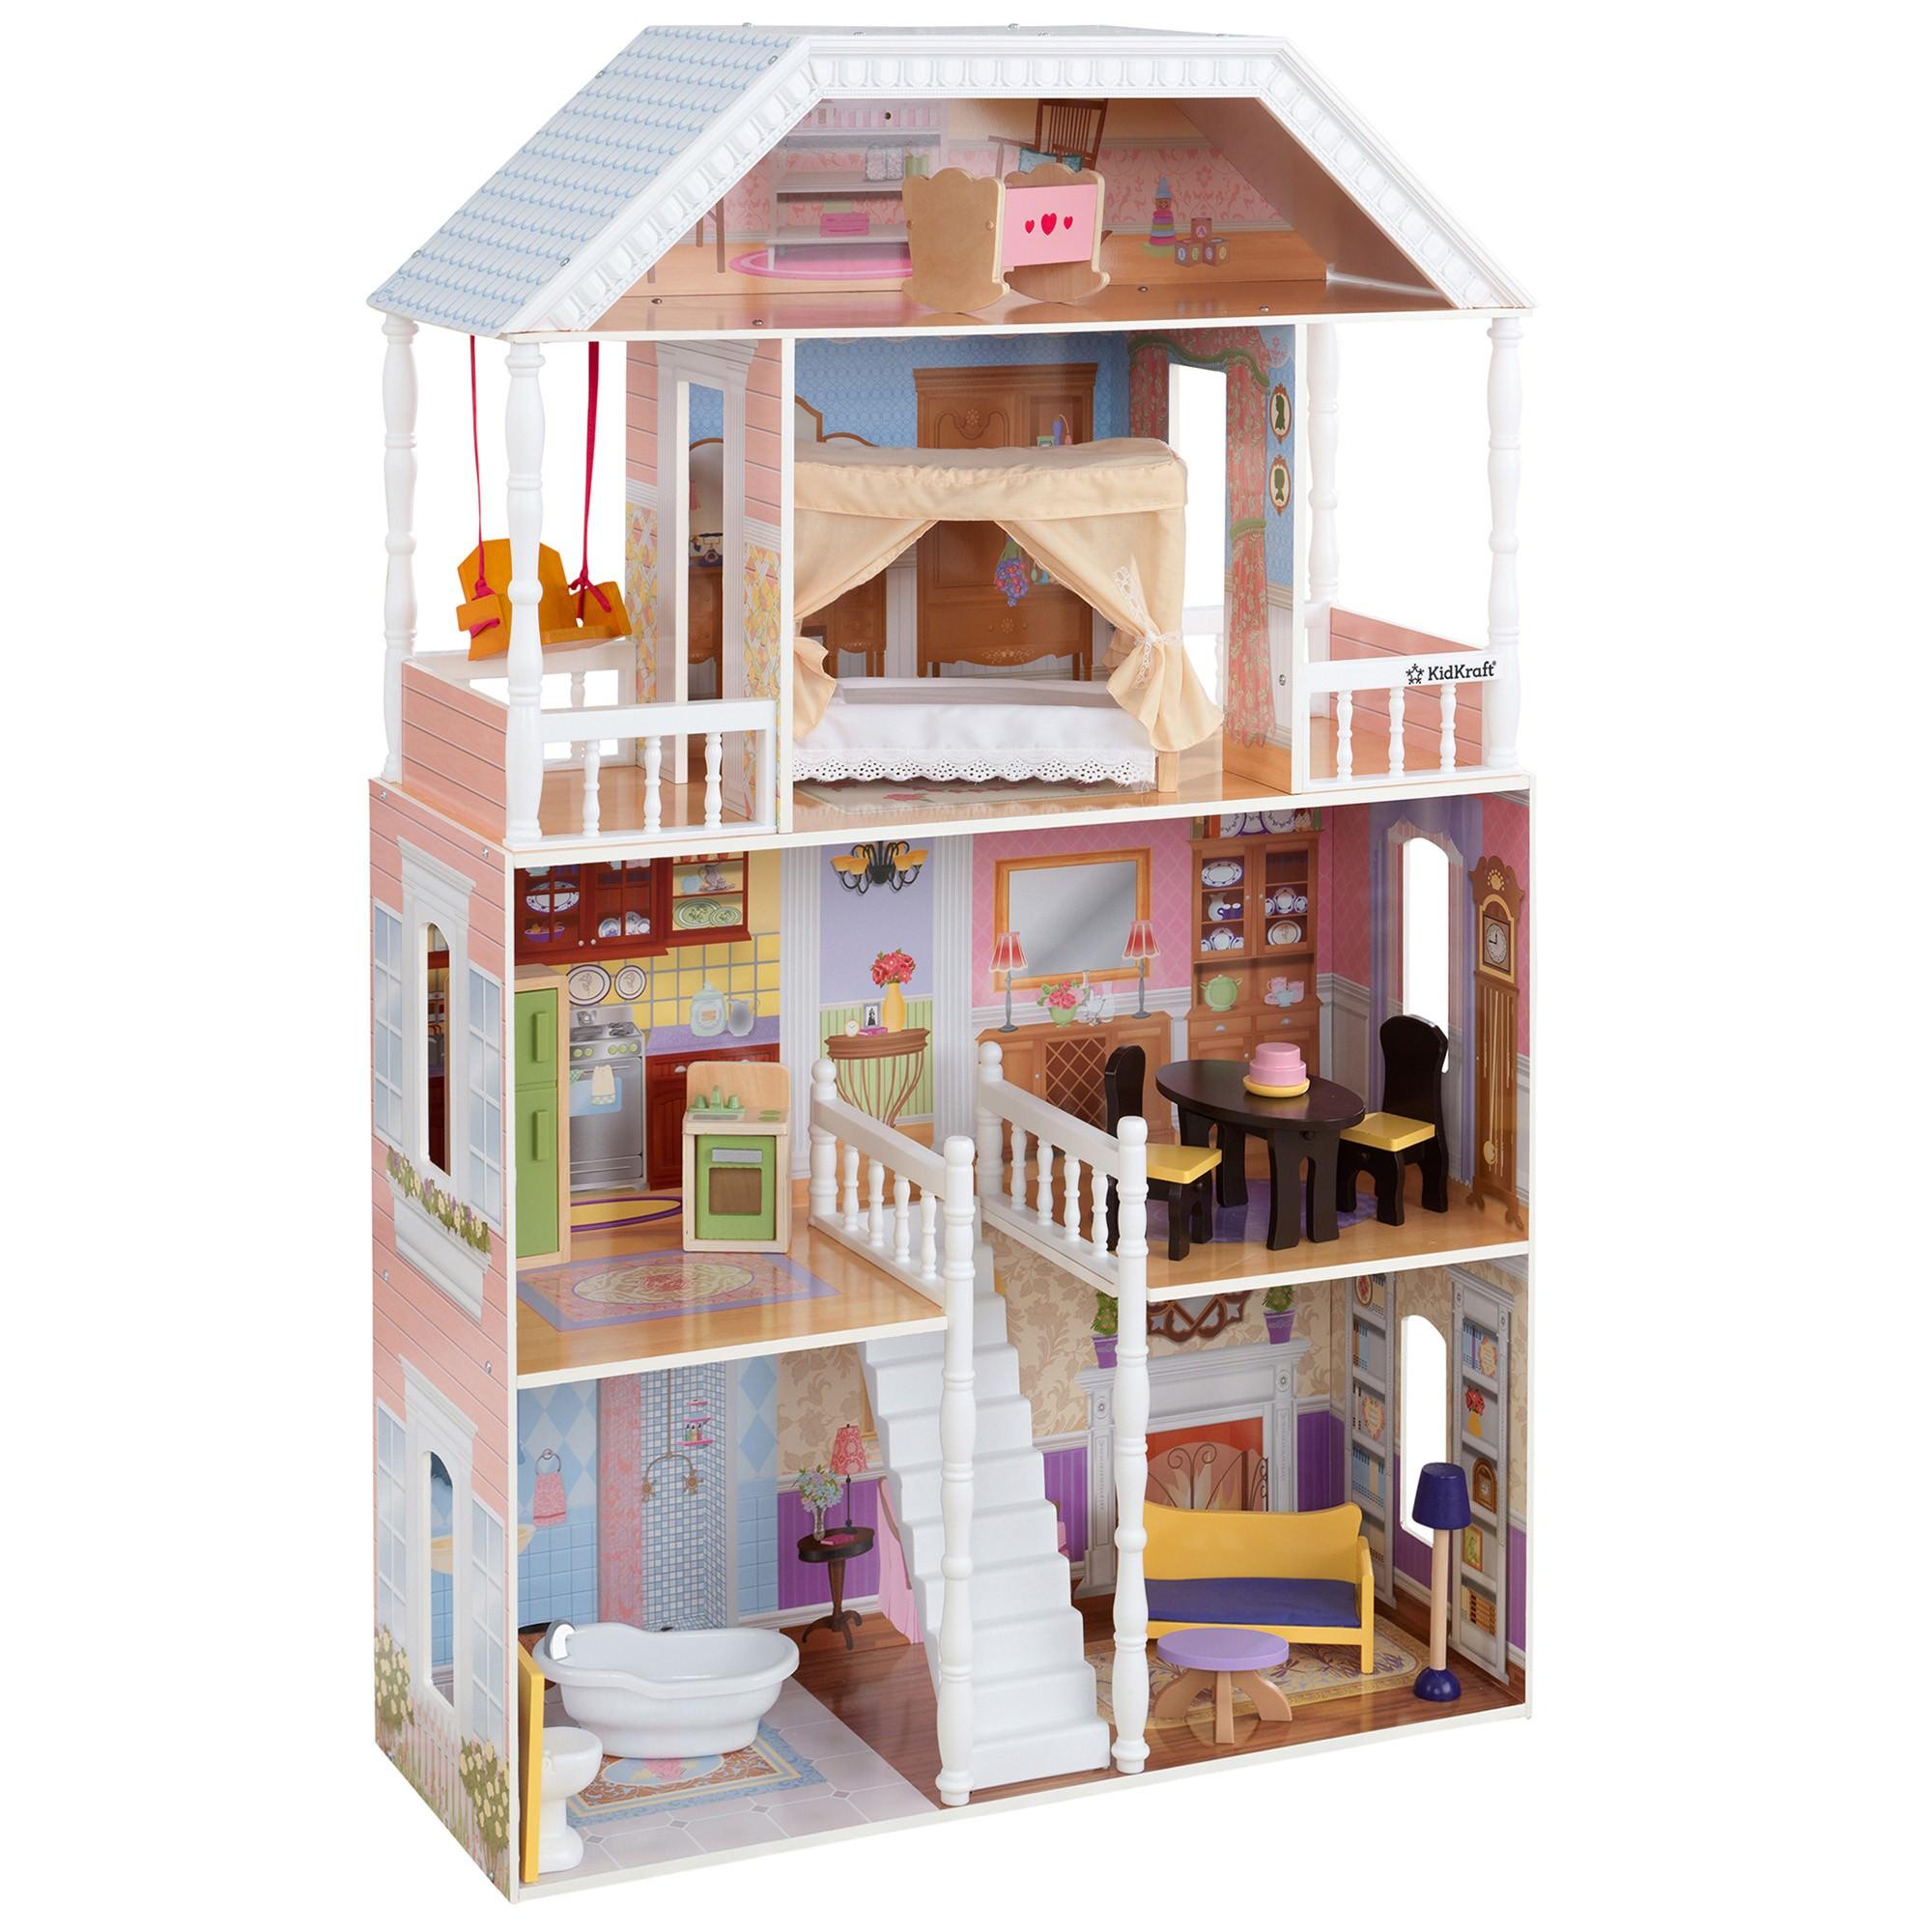 Kidkraft New Savannah Dollhouse (14 pc furniture)